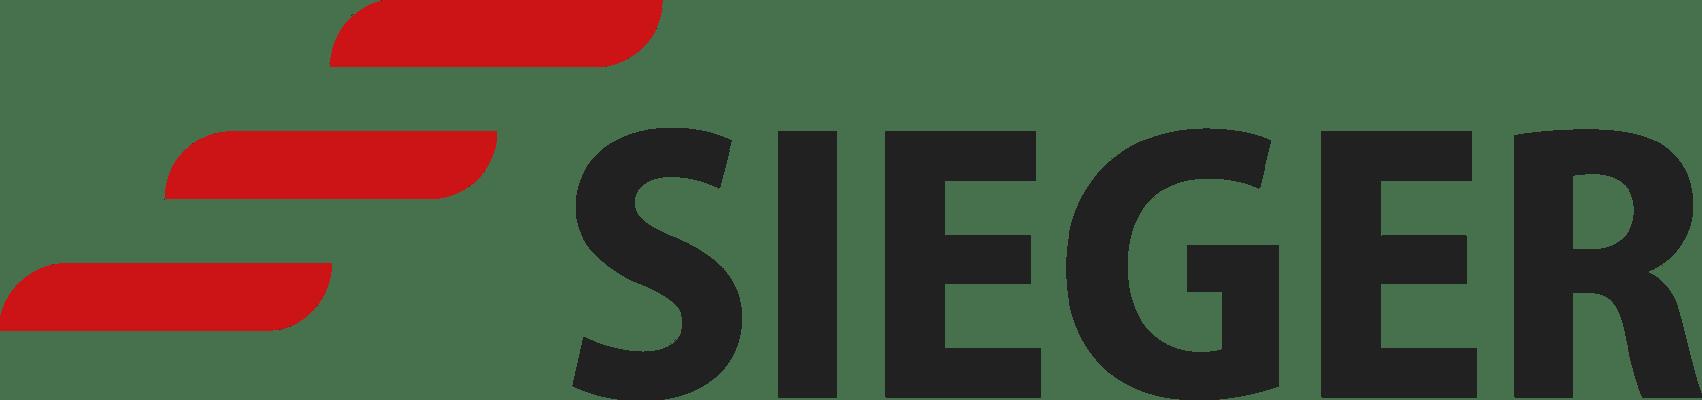 logo_schwarz-rot - Kopie